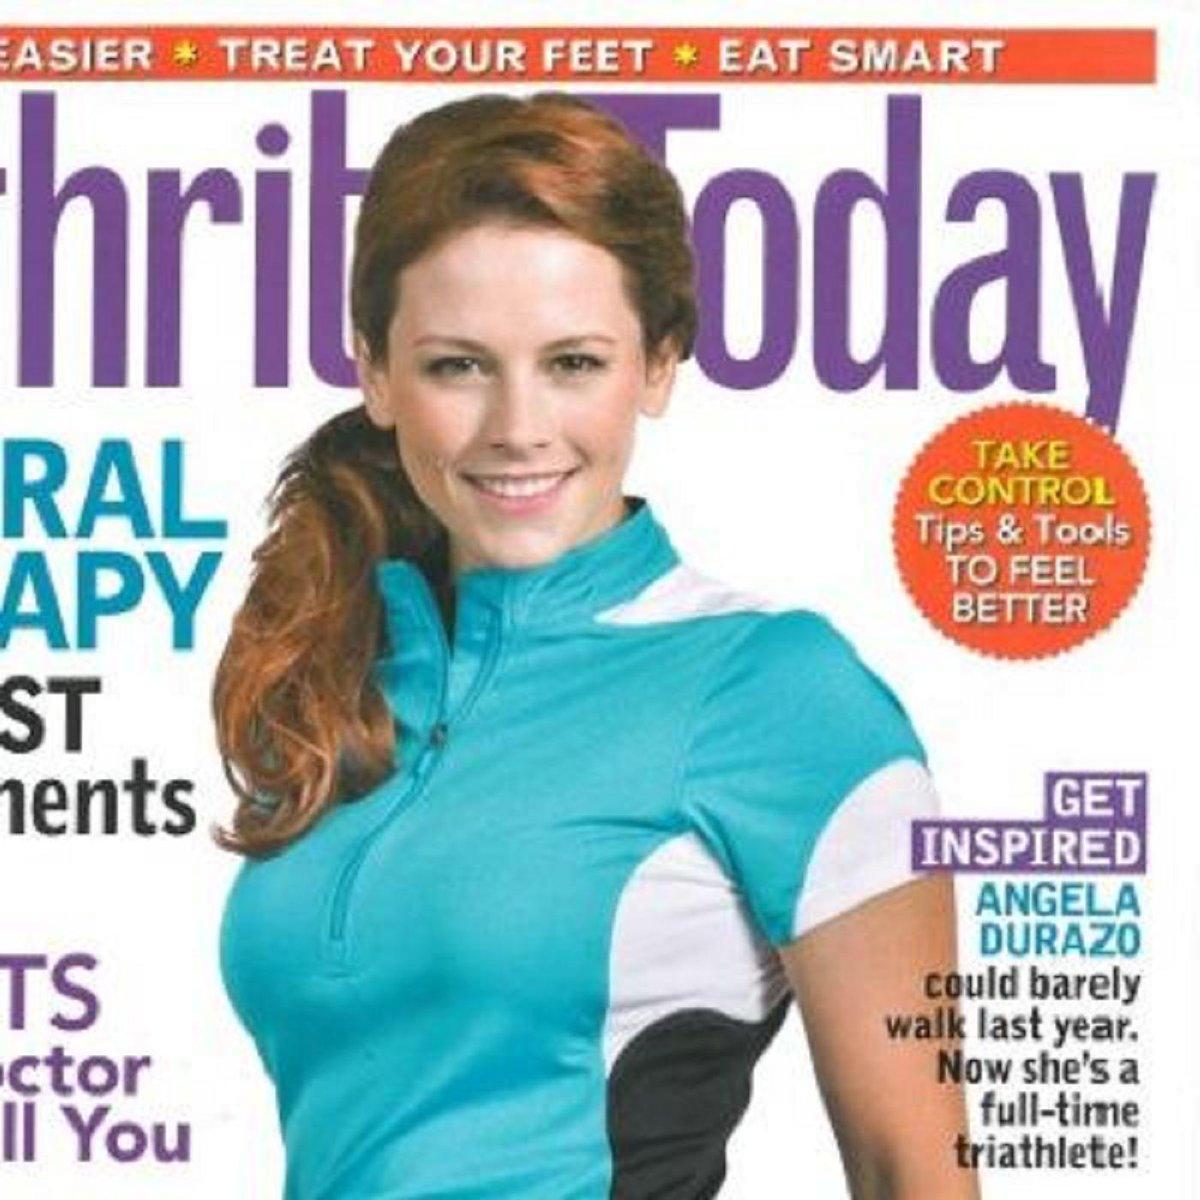 #FF @AngelaDurazo Fmr #Pro #Triathlete #Actress #Model Fighting/Speaking #RheumatoidArthritis. http://t.co/3EQWfBCnQF http://t.co/zq0P181p7n